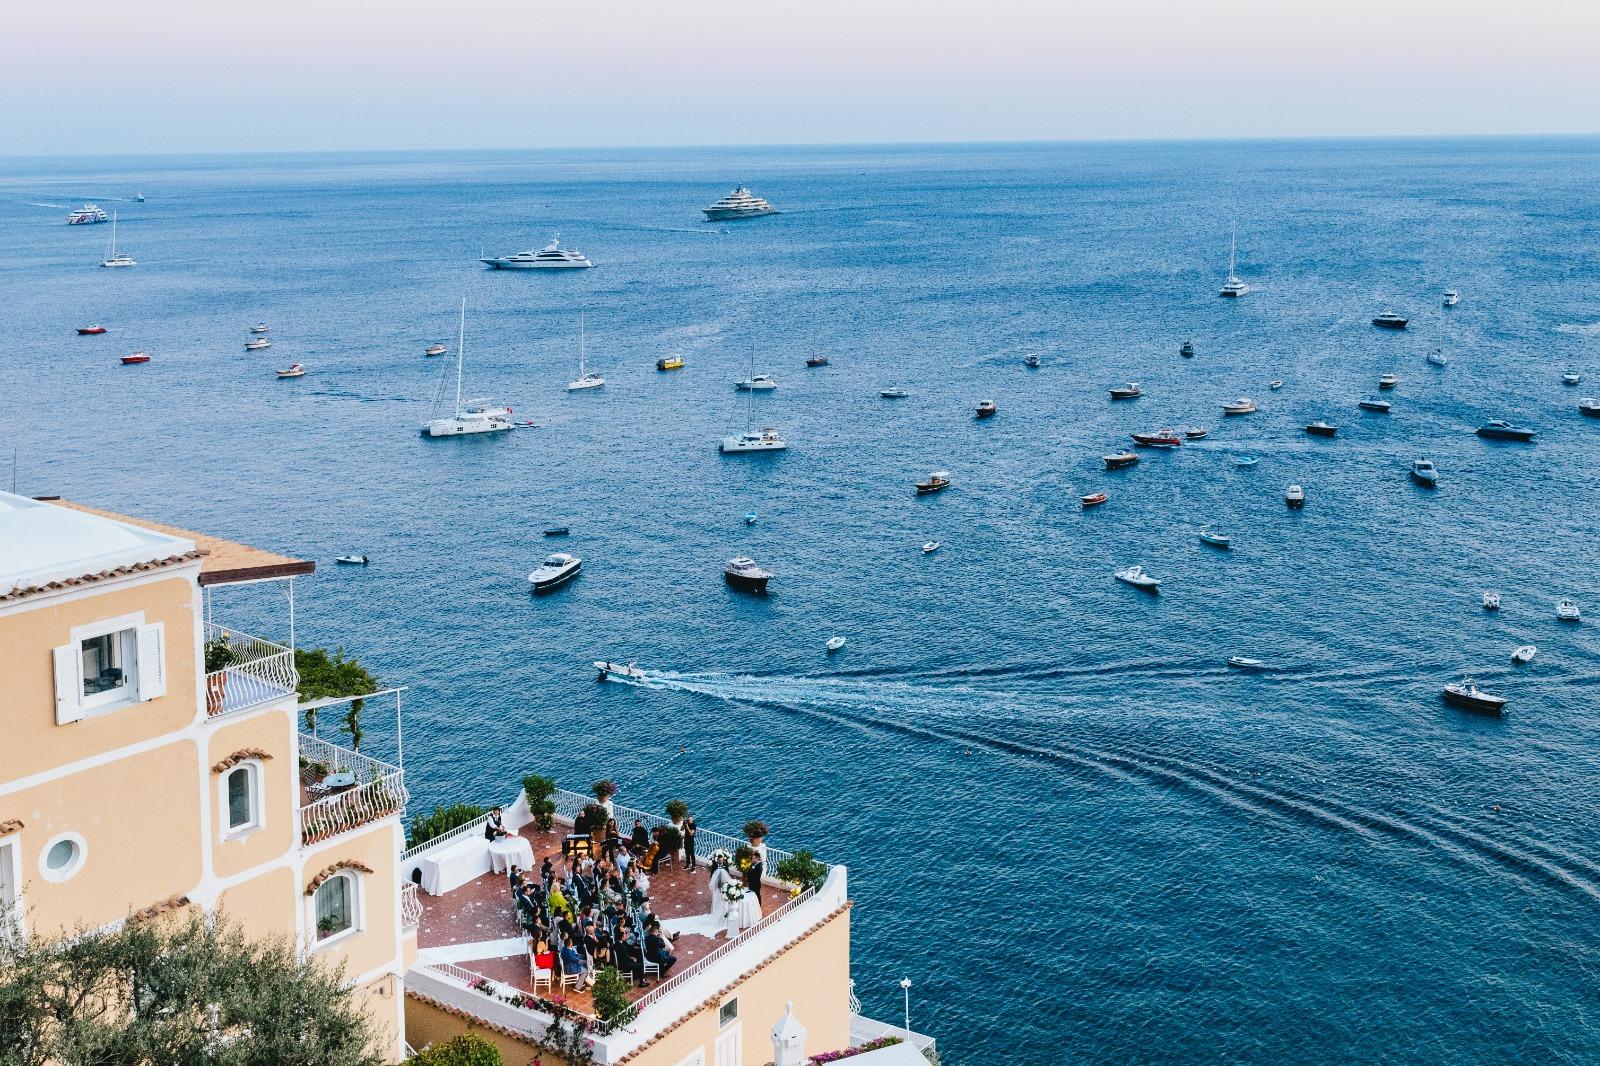 Exclusive weddings in Positano